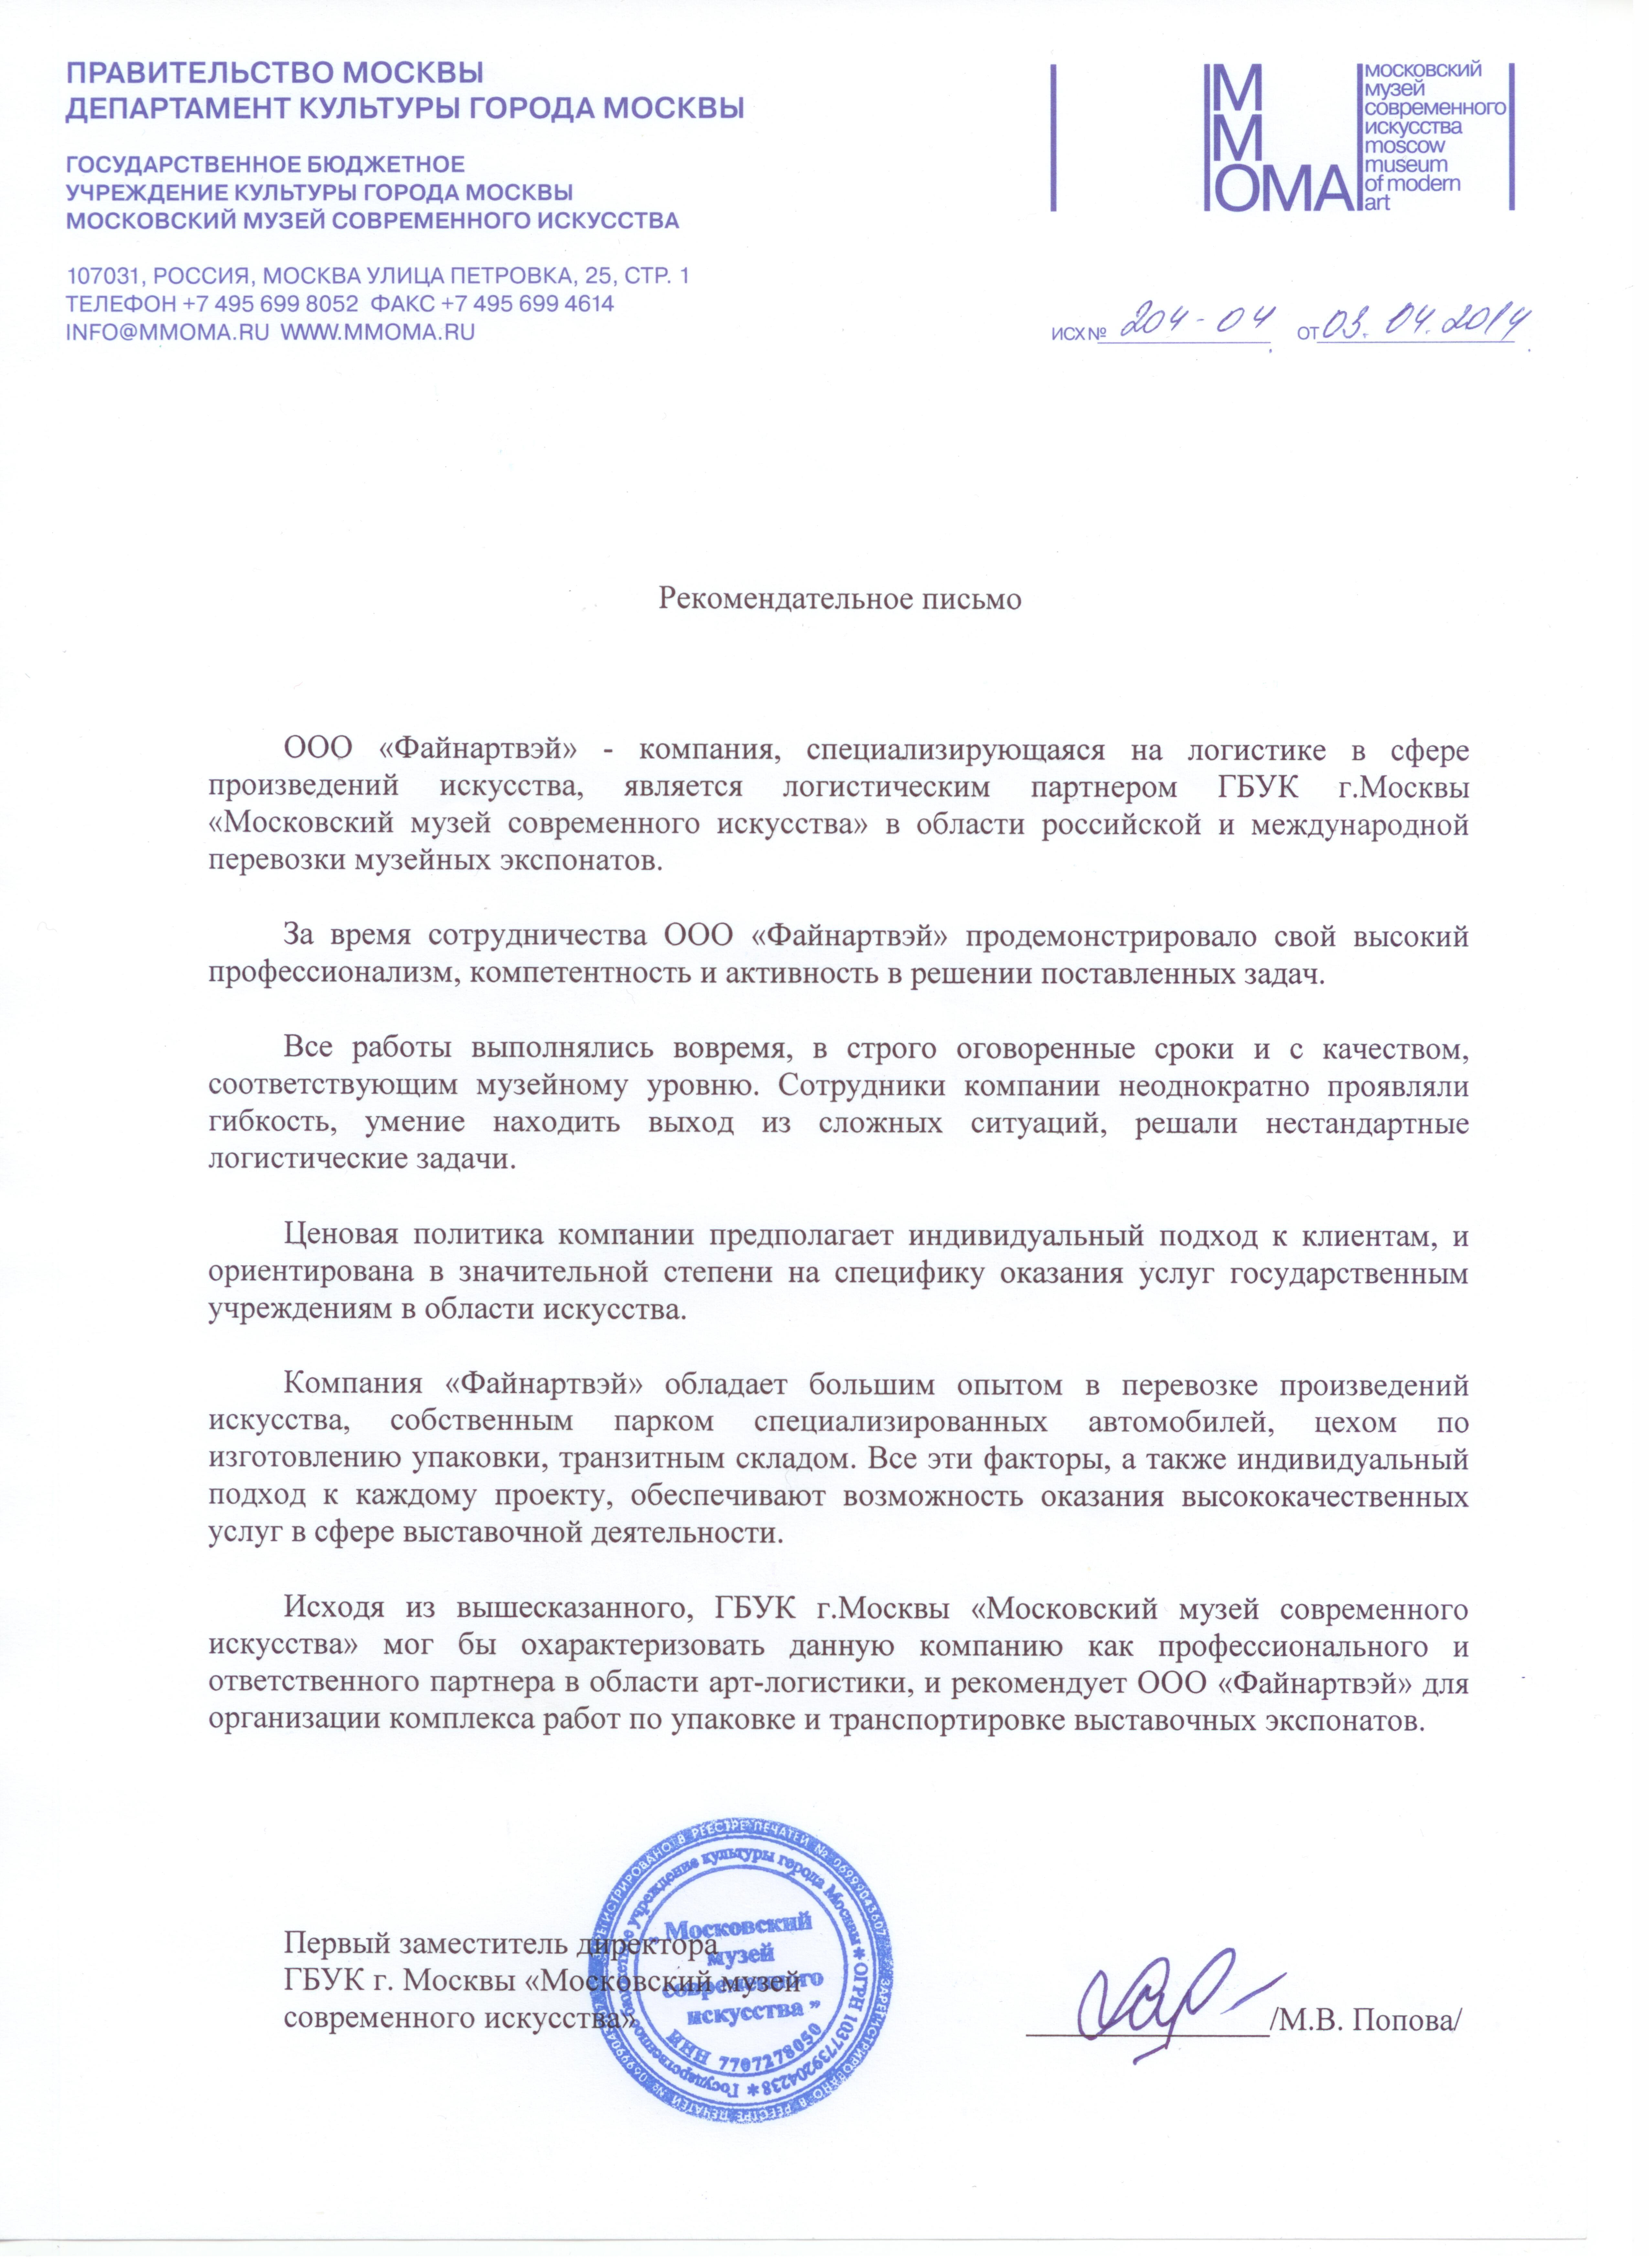 ММСИ - 2014